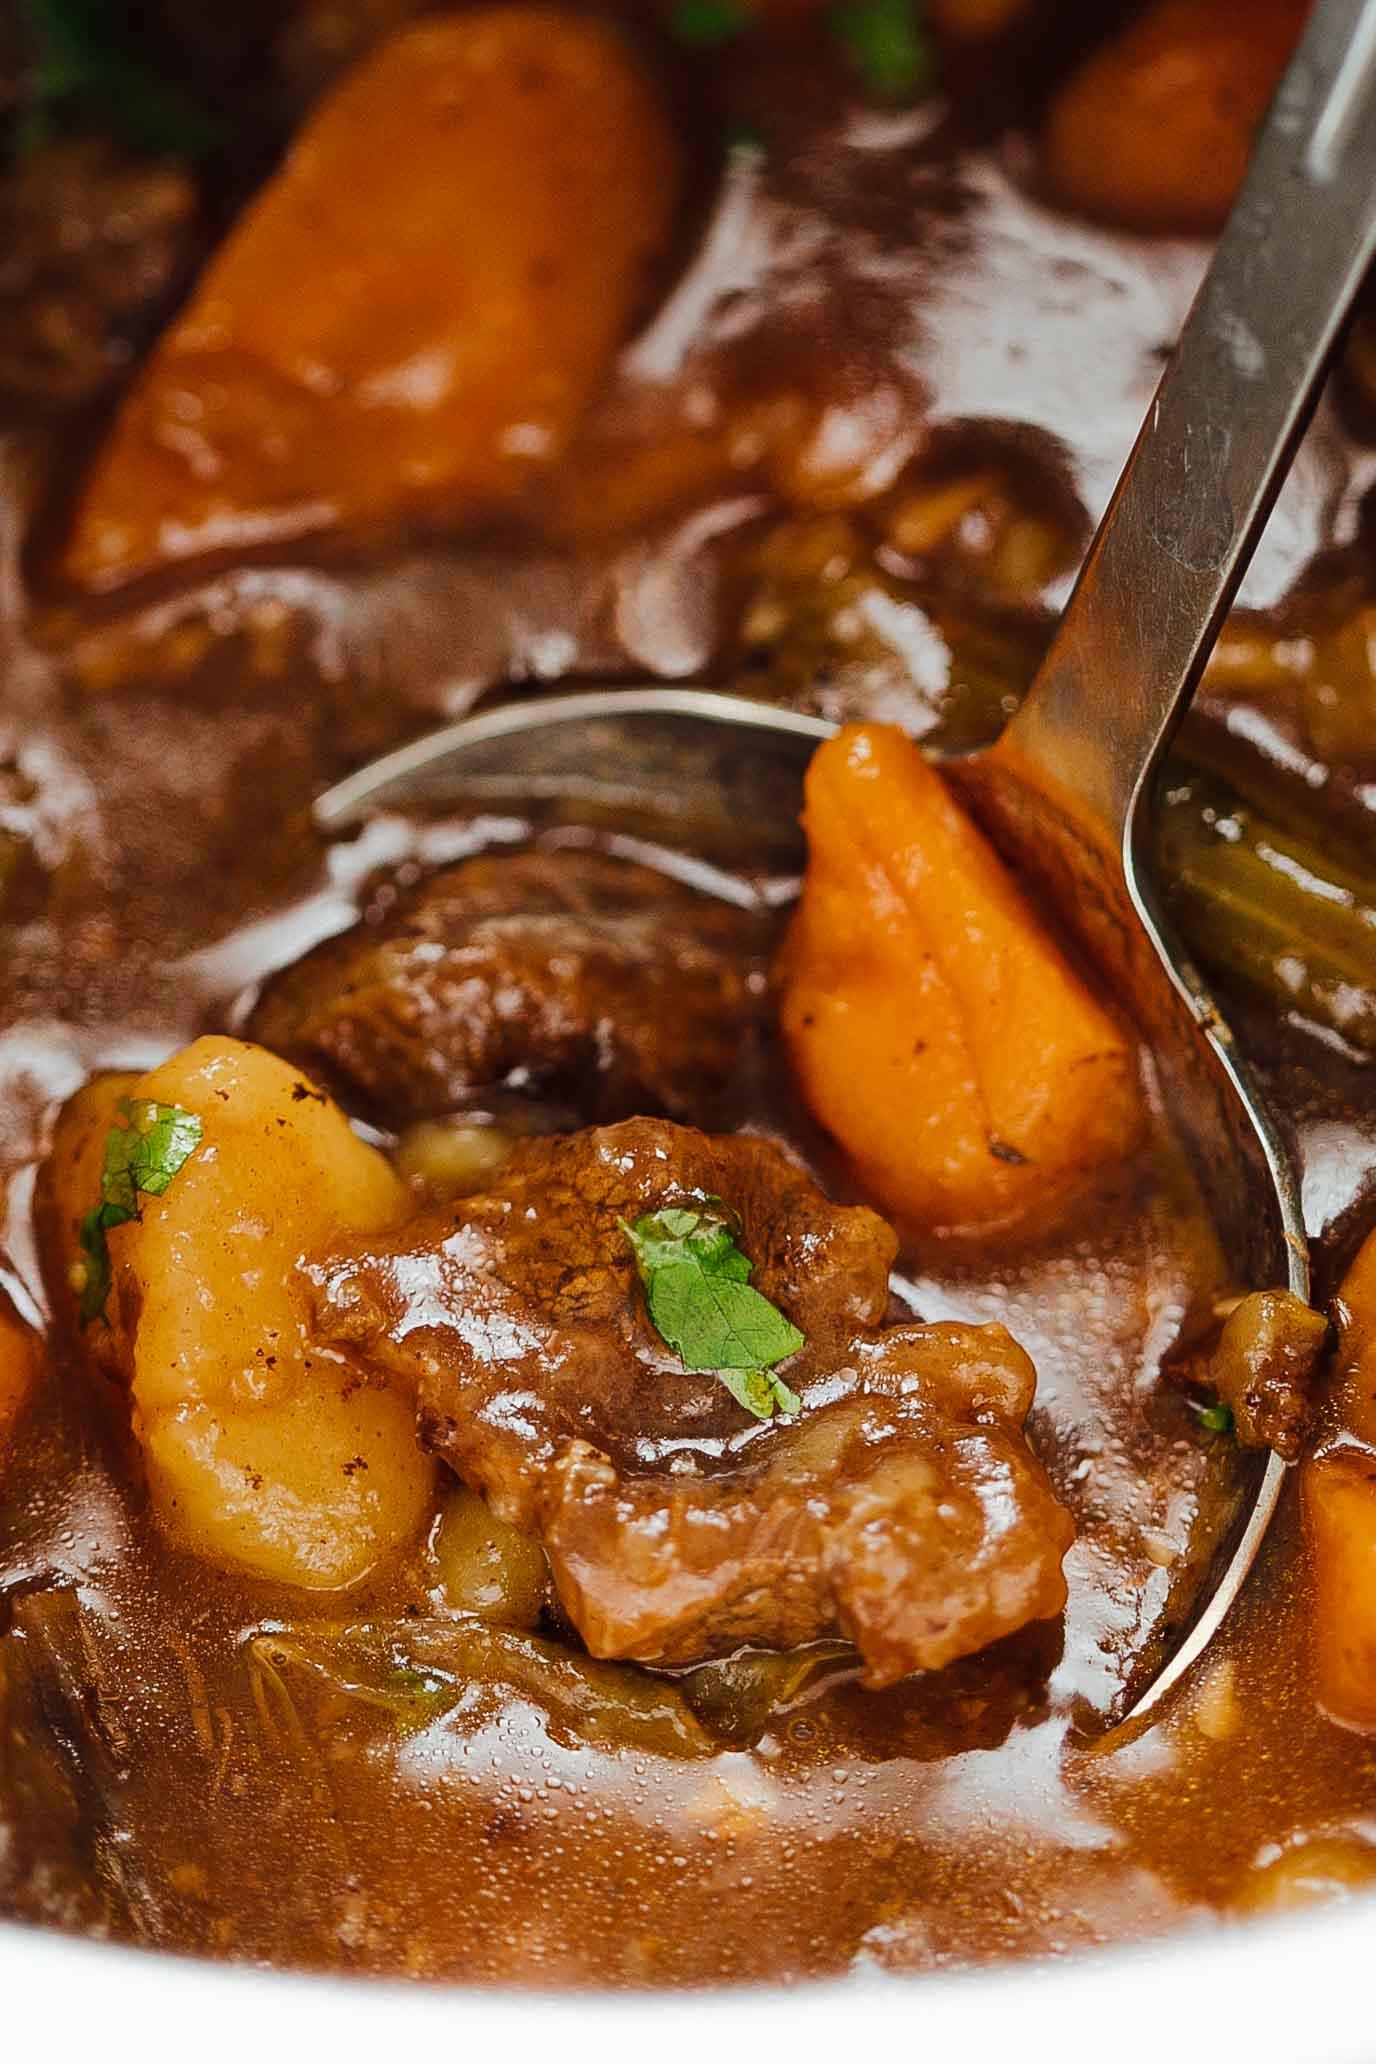 Easy-Instant-Pot-Beef-Stew-Pressure-Cooker-Recipe-3.jpg